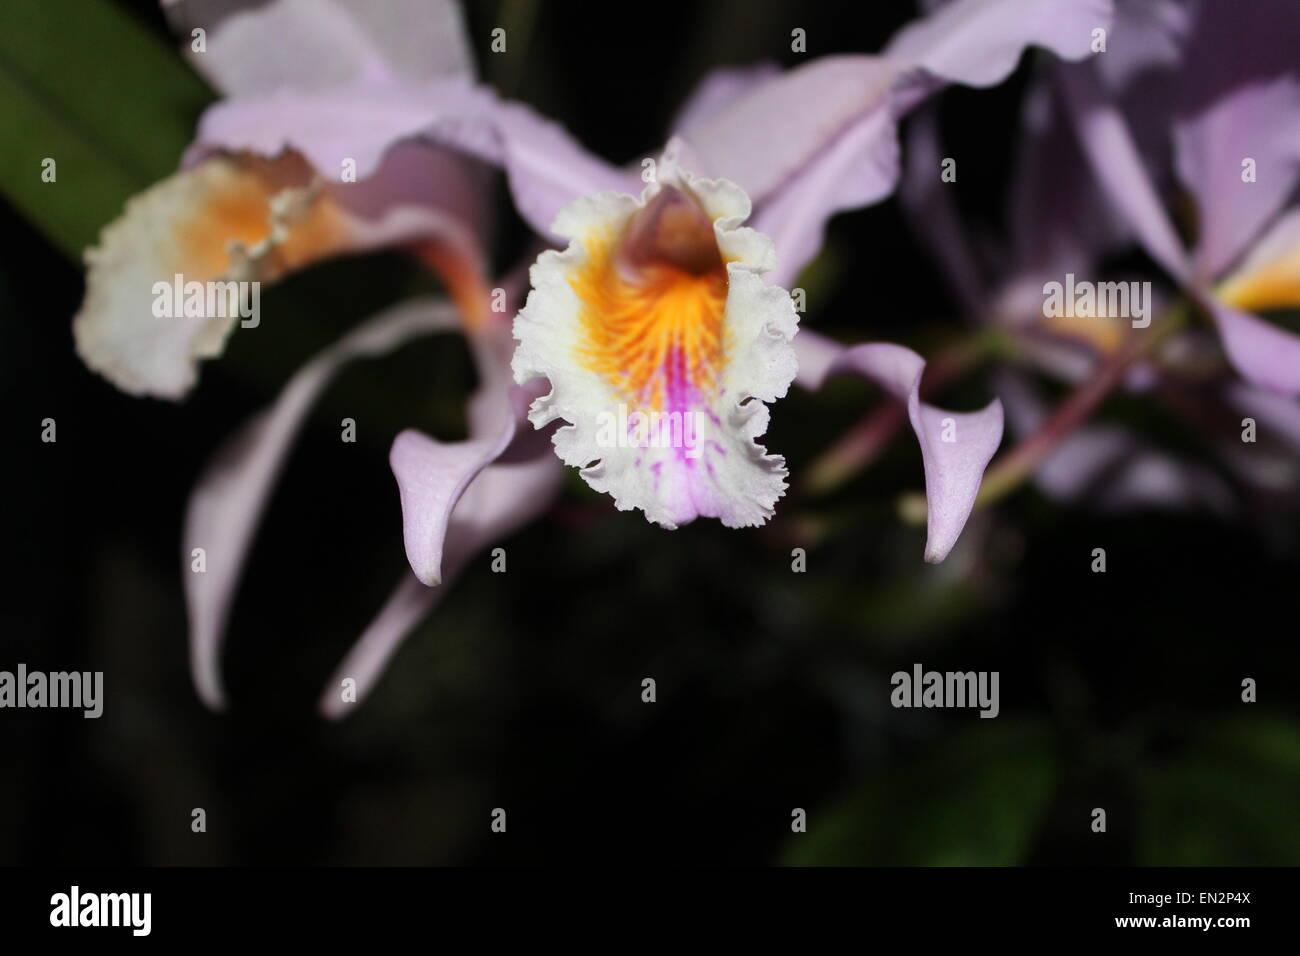 Orchidaceae, Orchid flower. - Stock Image